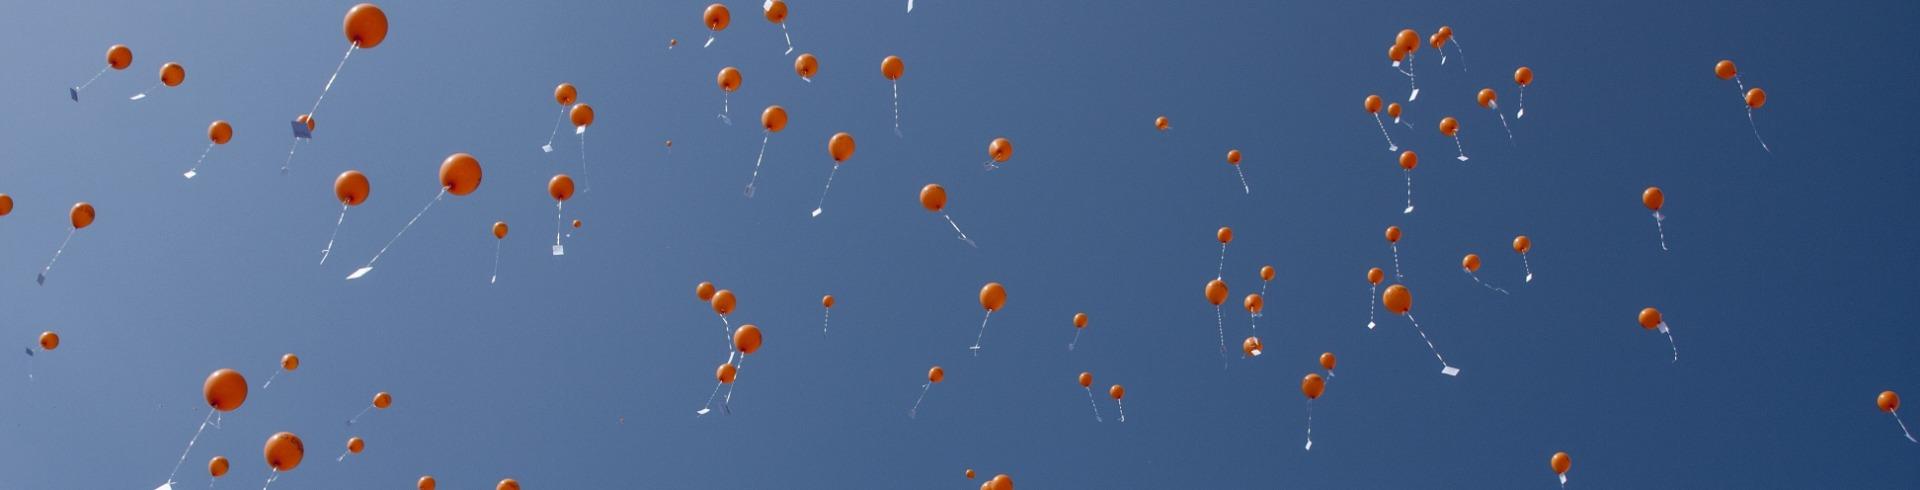 orange balloons released in the sky